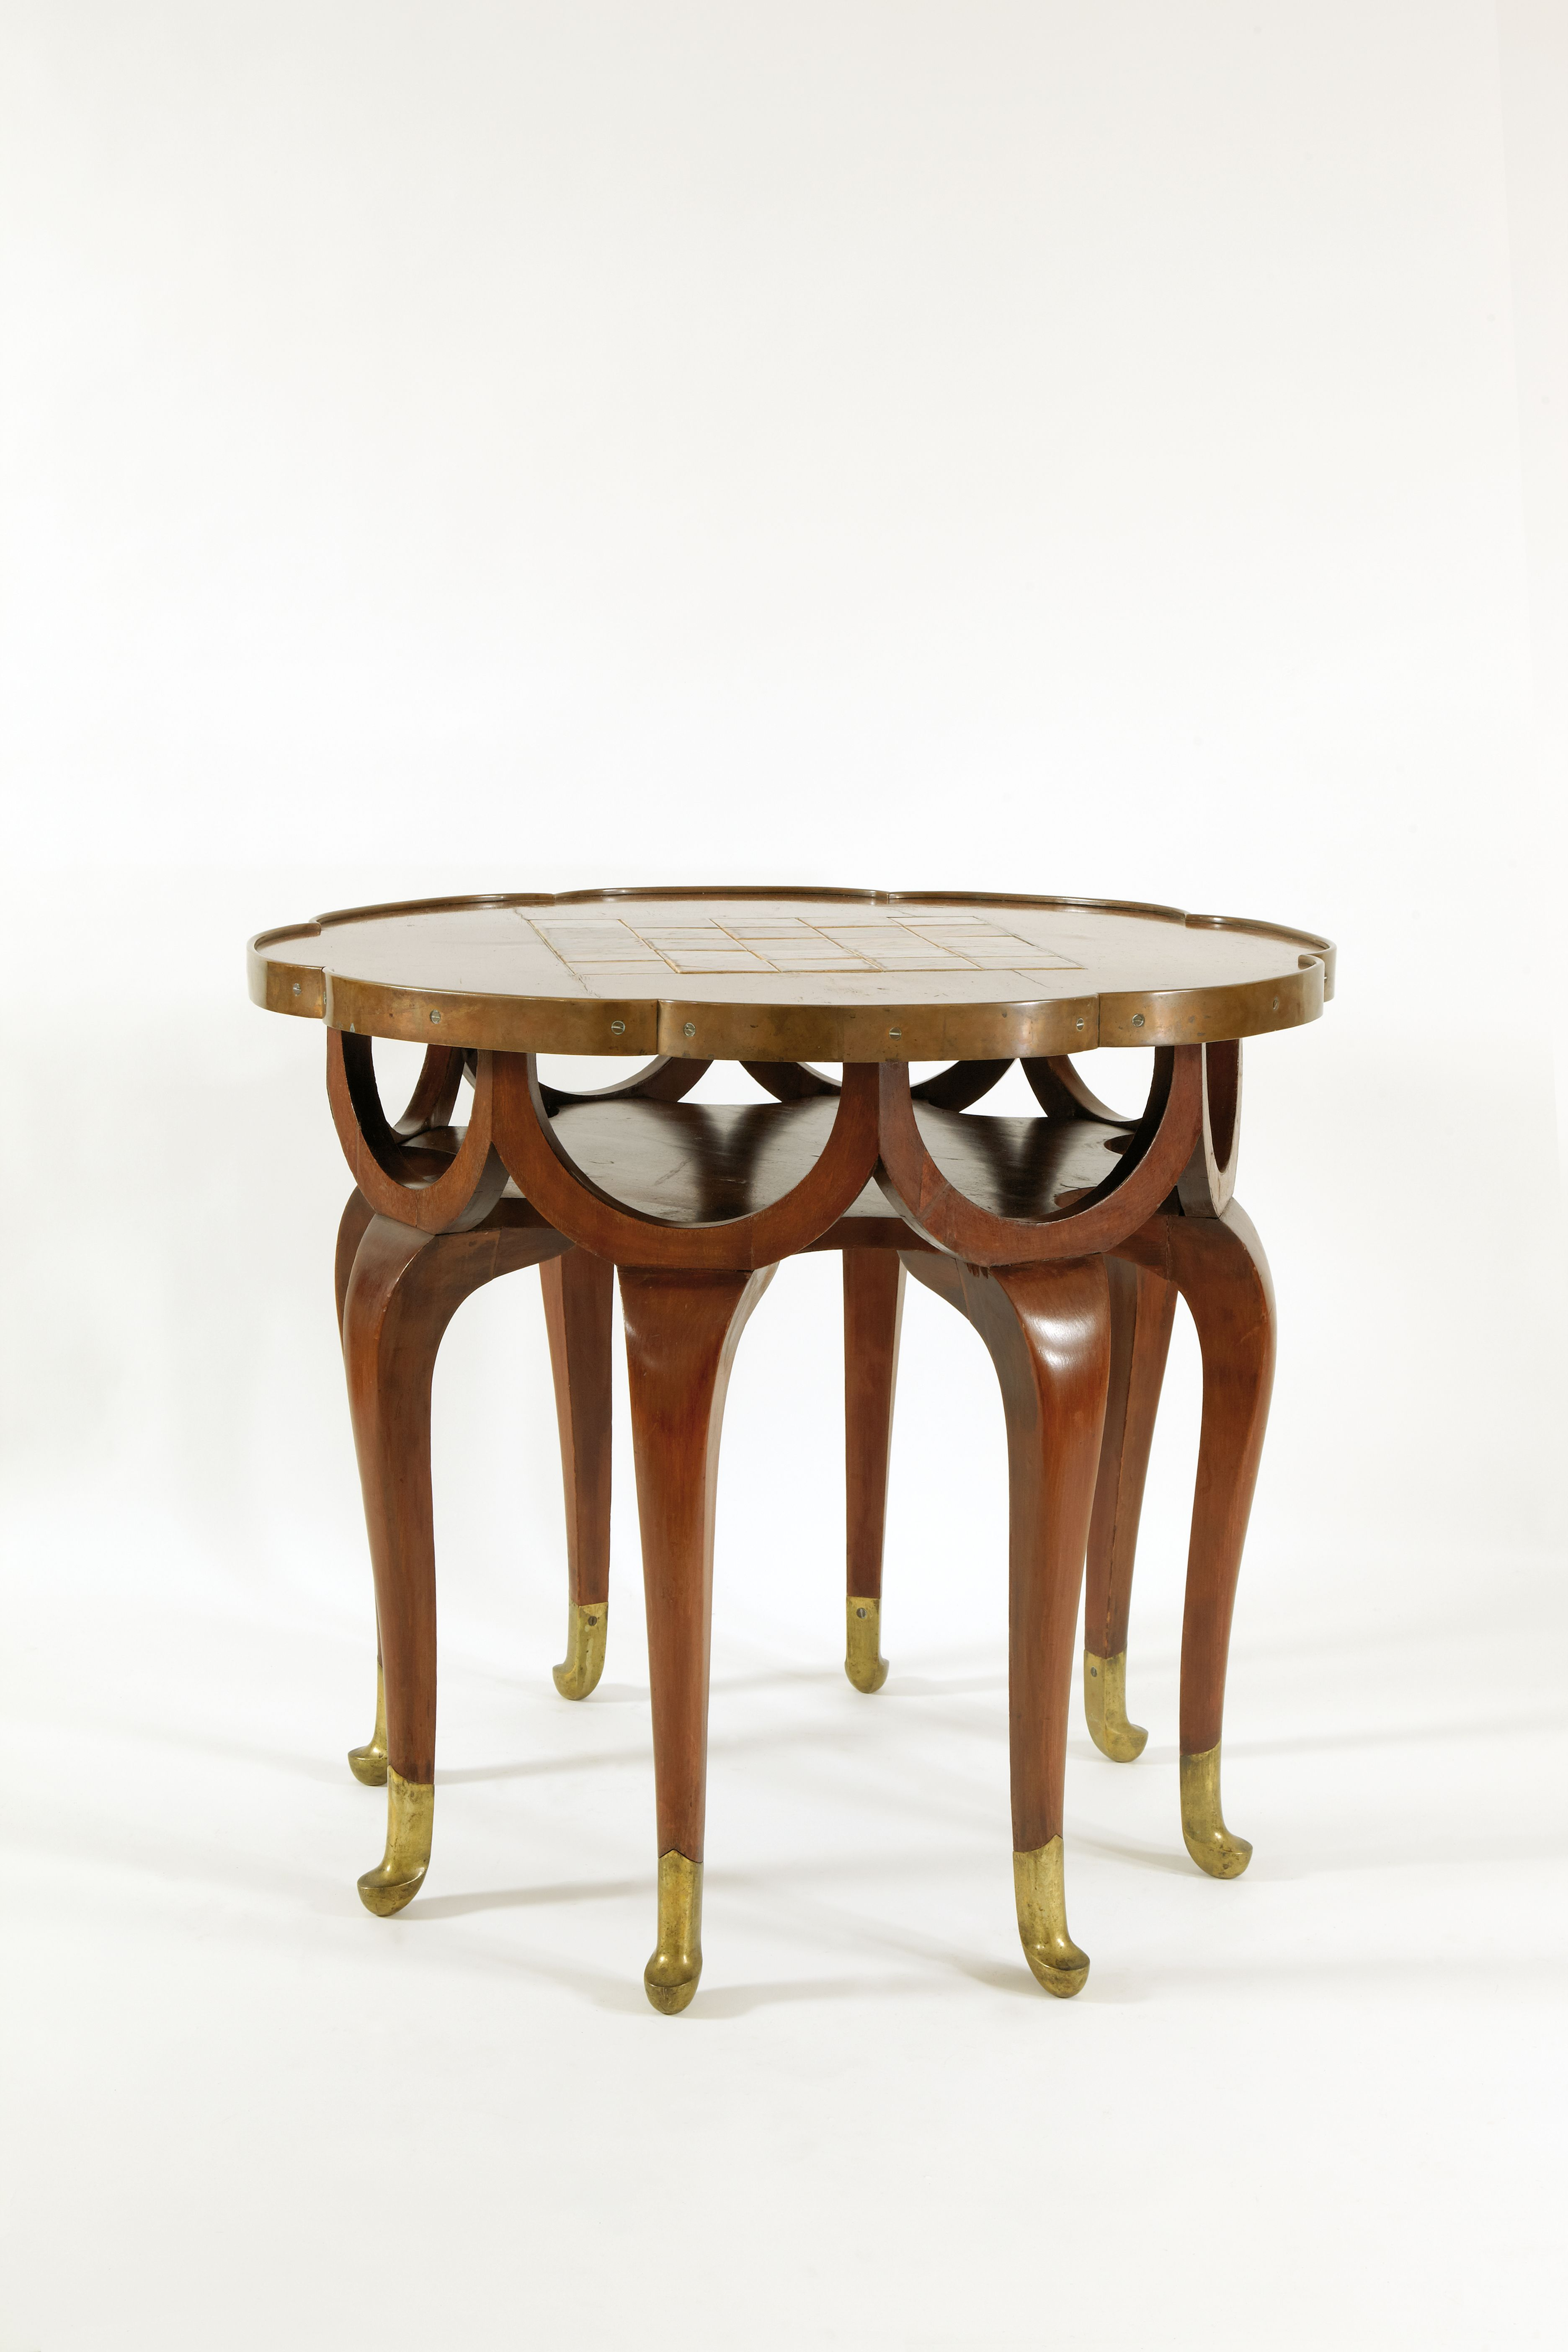 mesa-c1900-utilizada-por-adolf-loos-f-o-schmidt-coleccion-hummel-viena-foto-gisela-erlacher